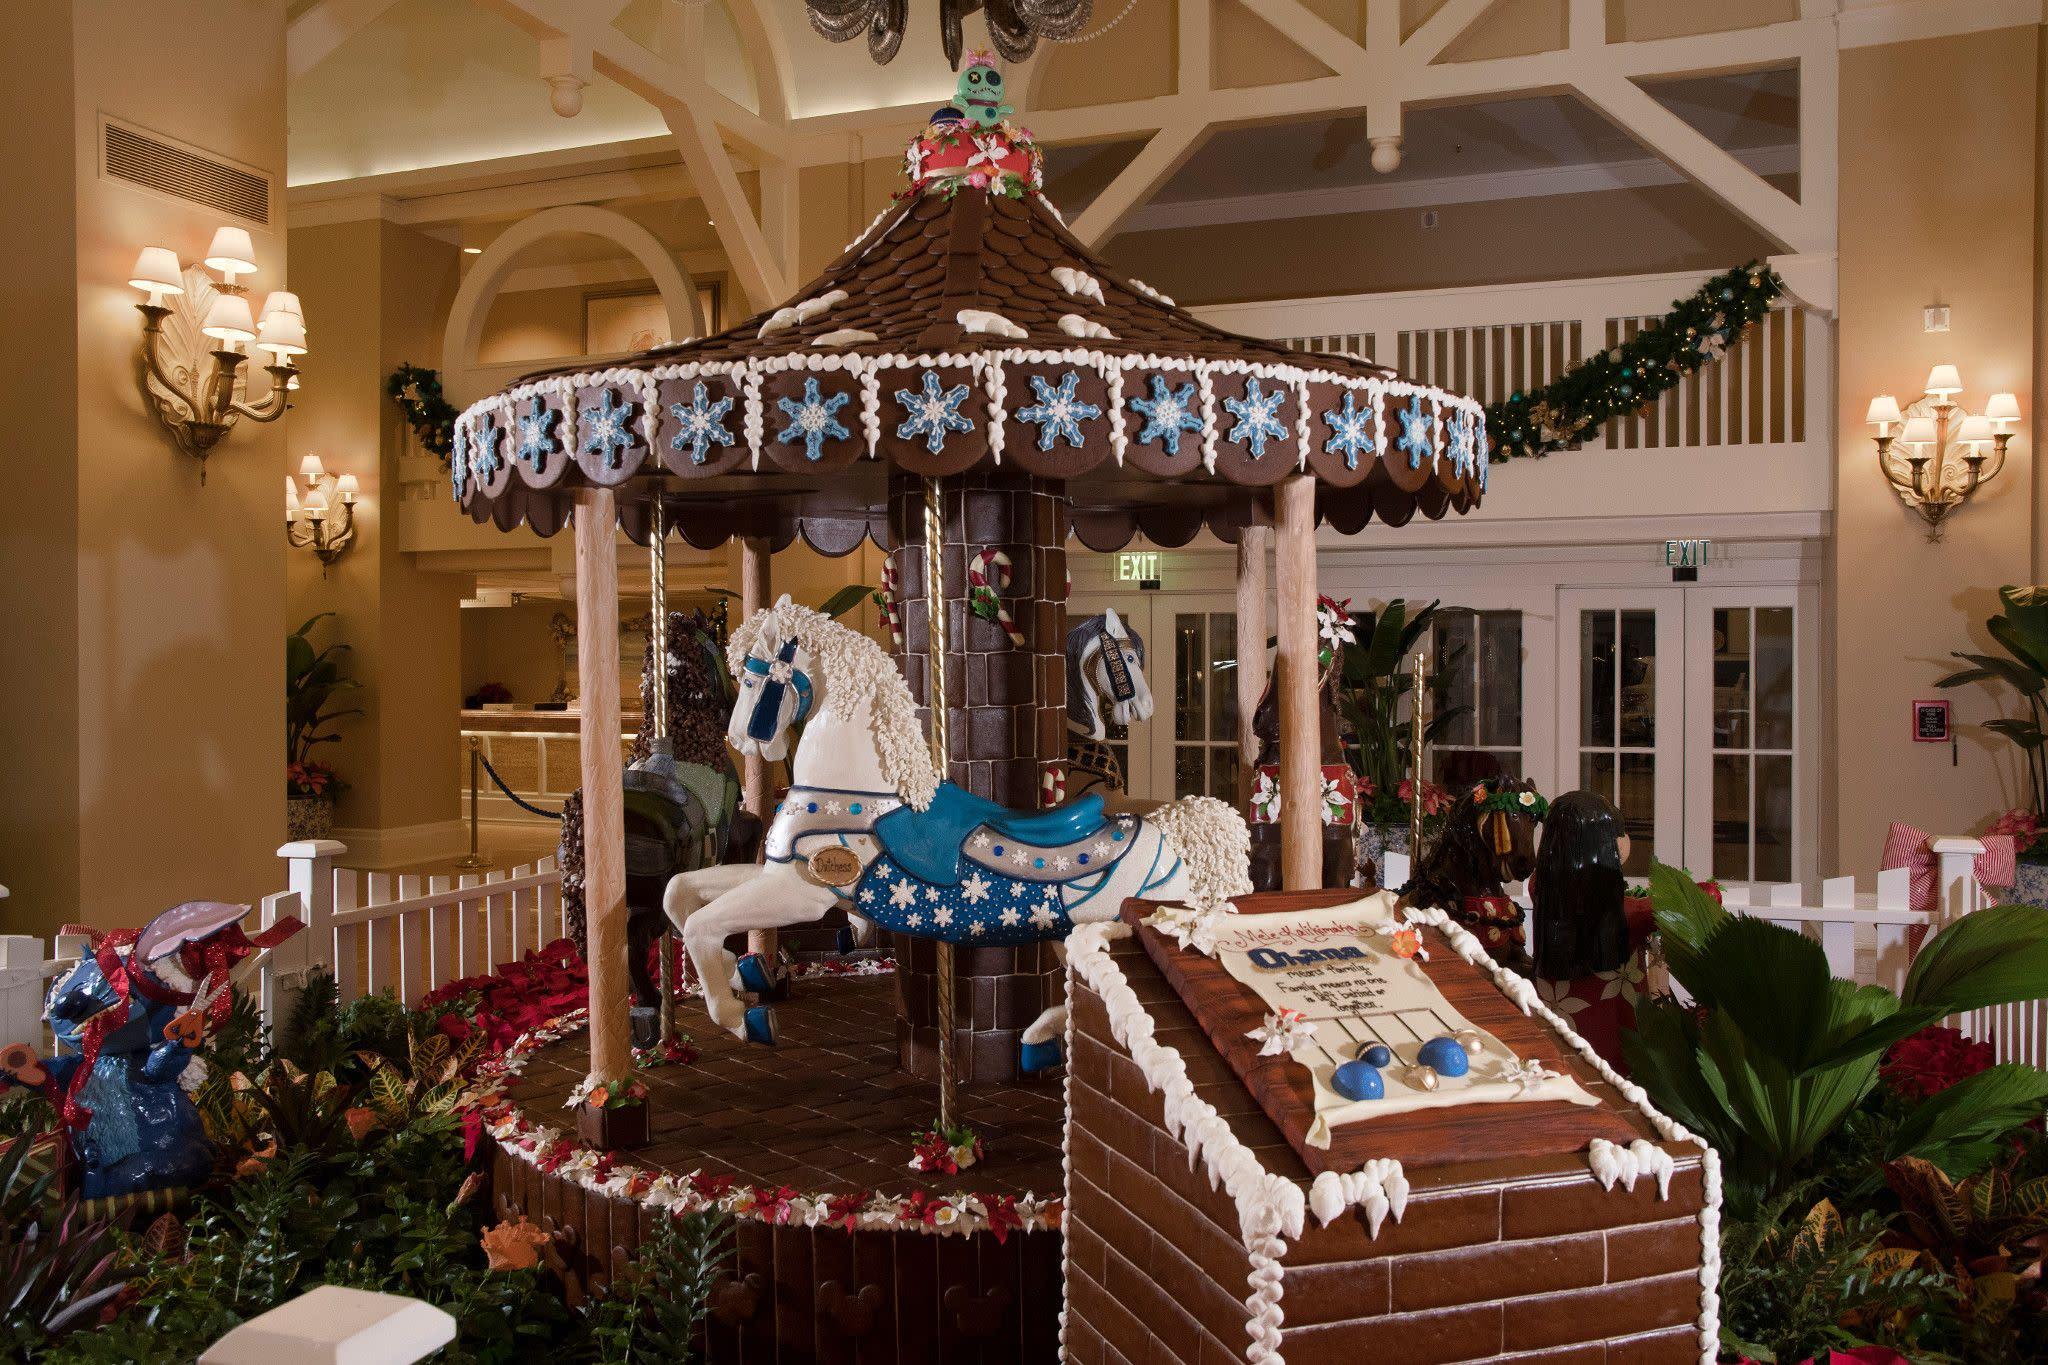 Gingerbread Horse Carousel at Disney's Beach Club Resort at Walt Disney World Resort in Orlando